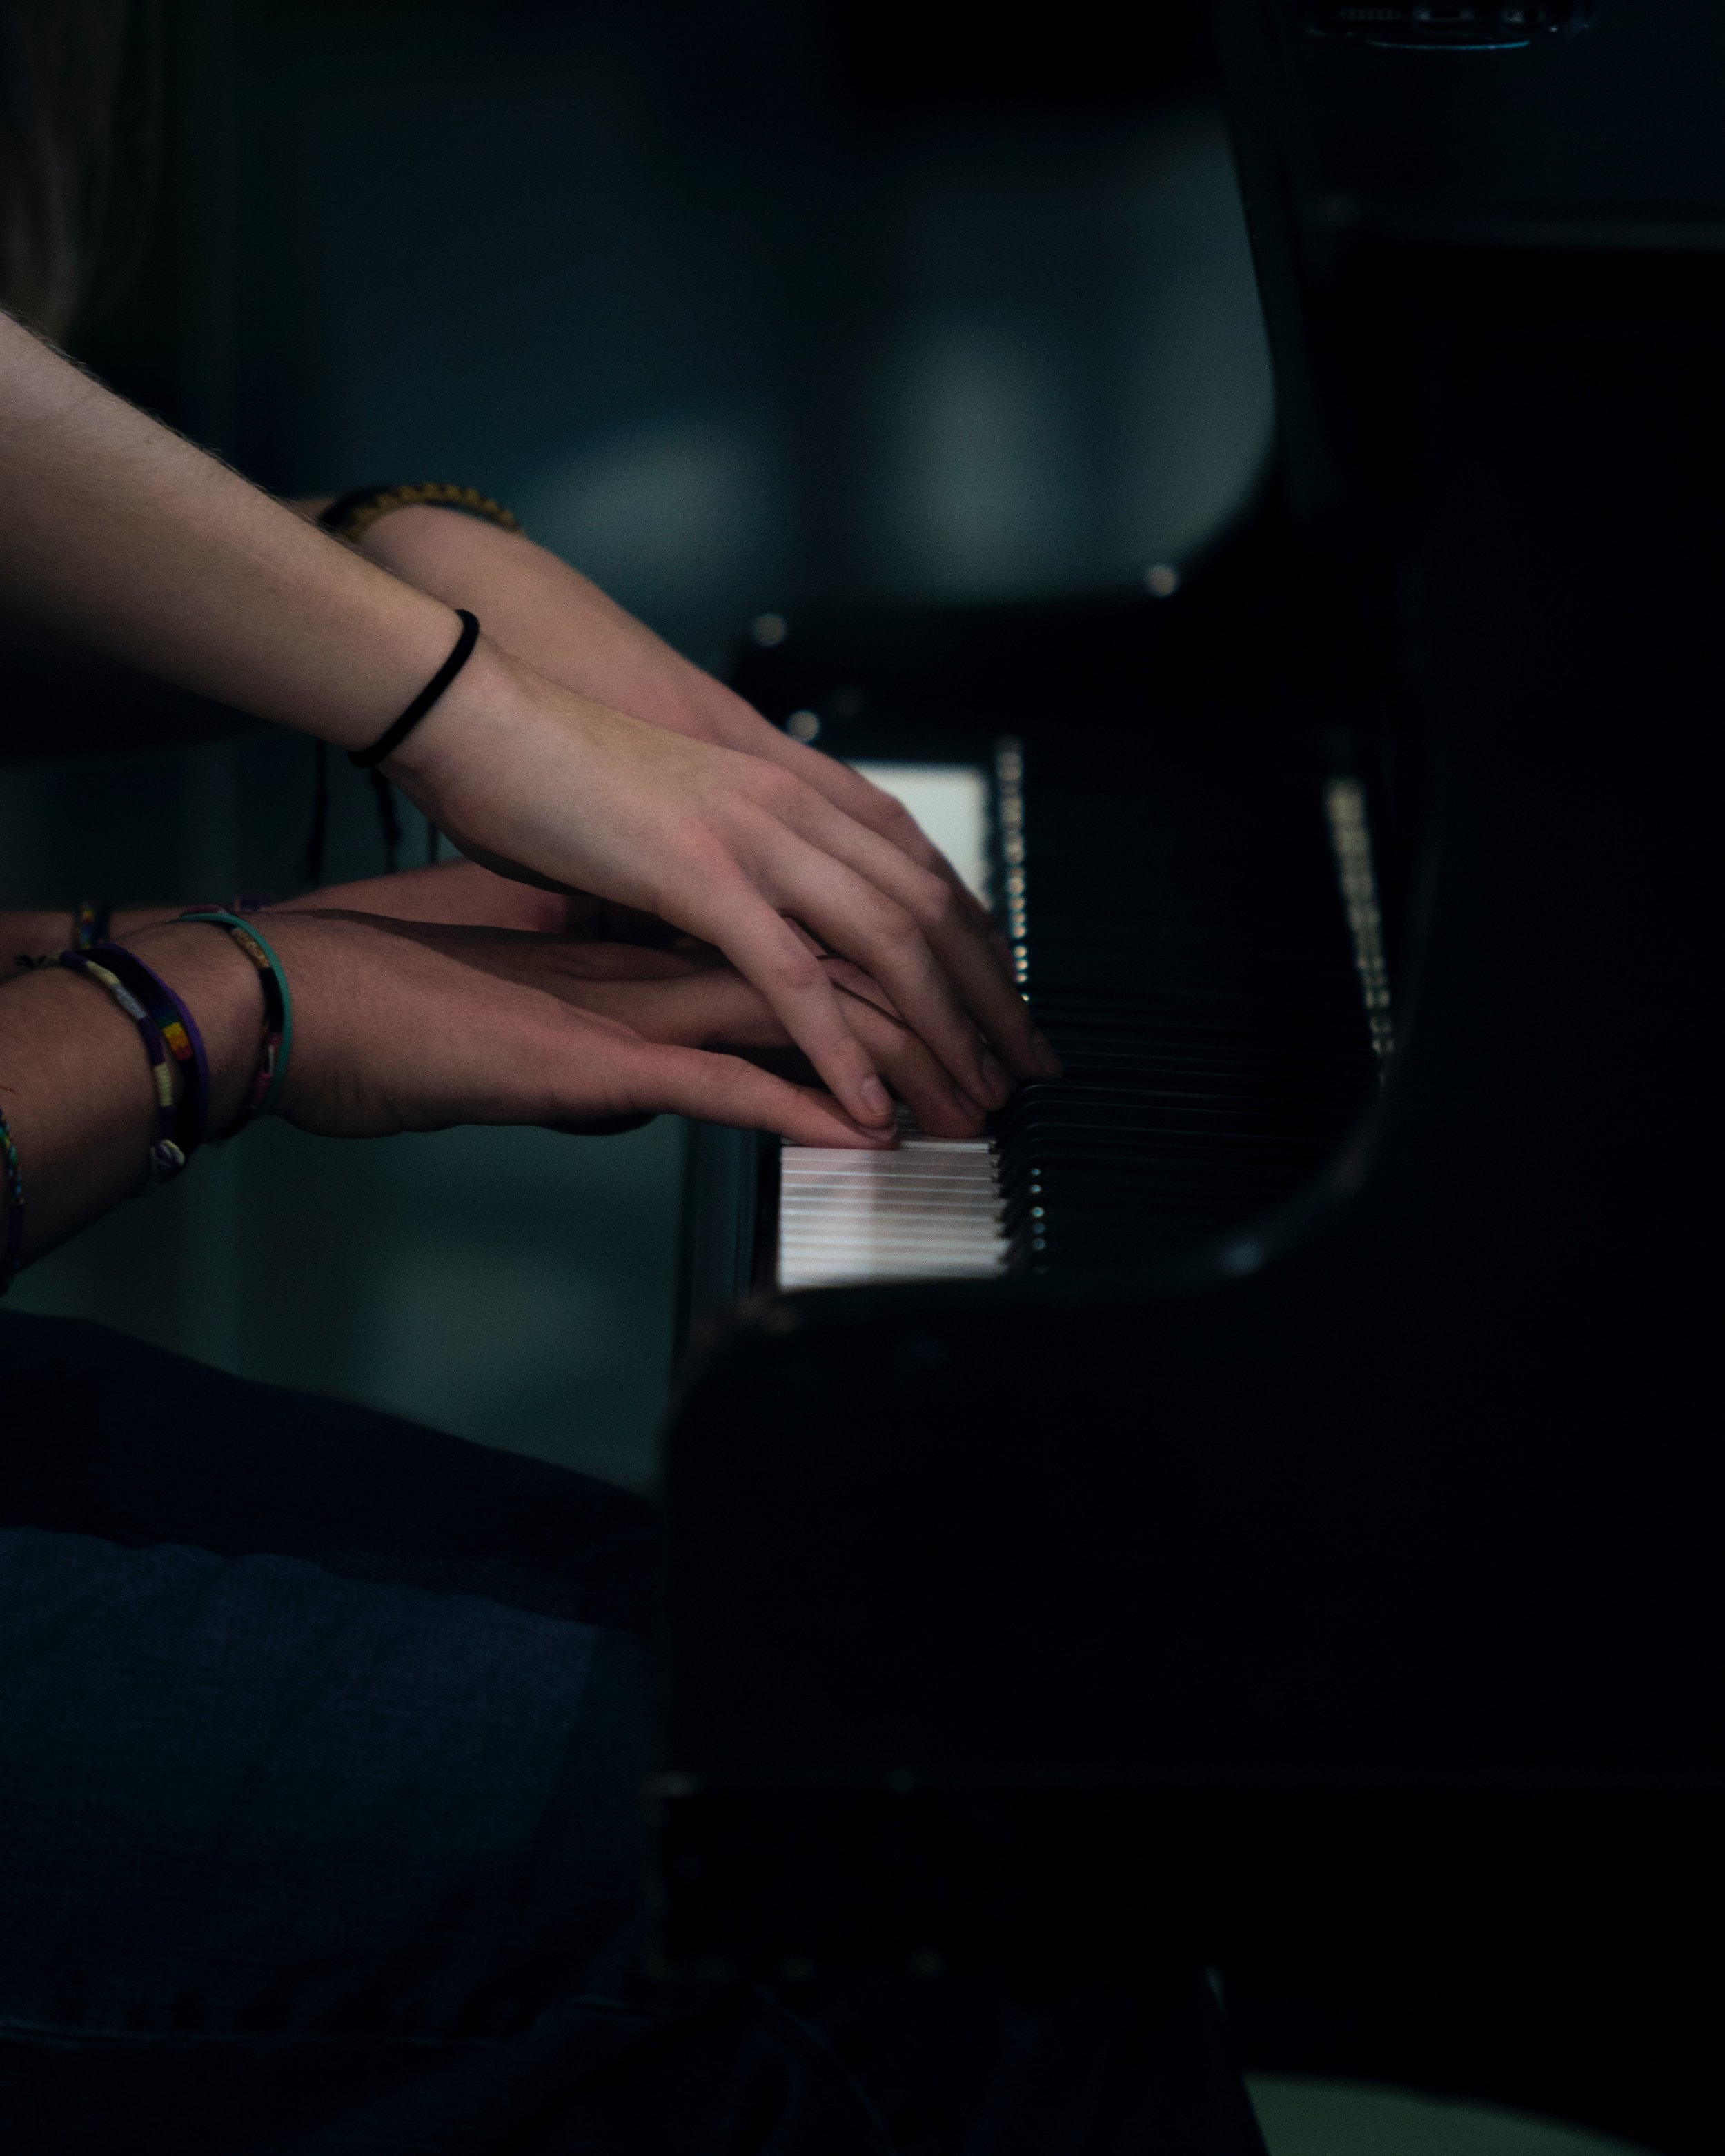 piano-hands-teacher-yousef-alfuhigi-451946.jpg